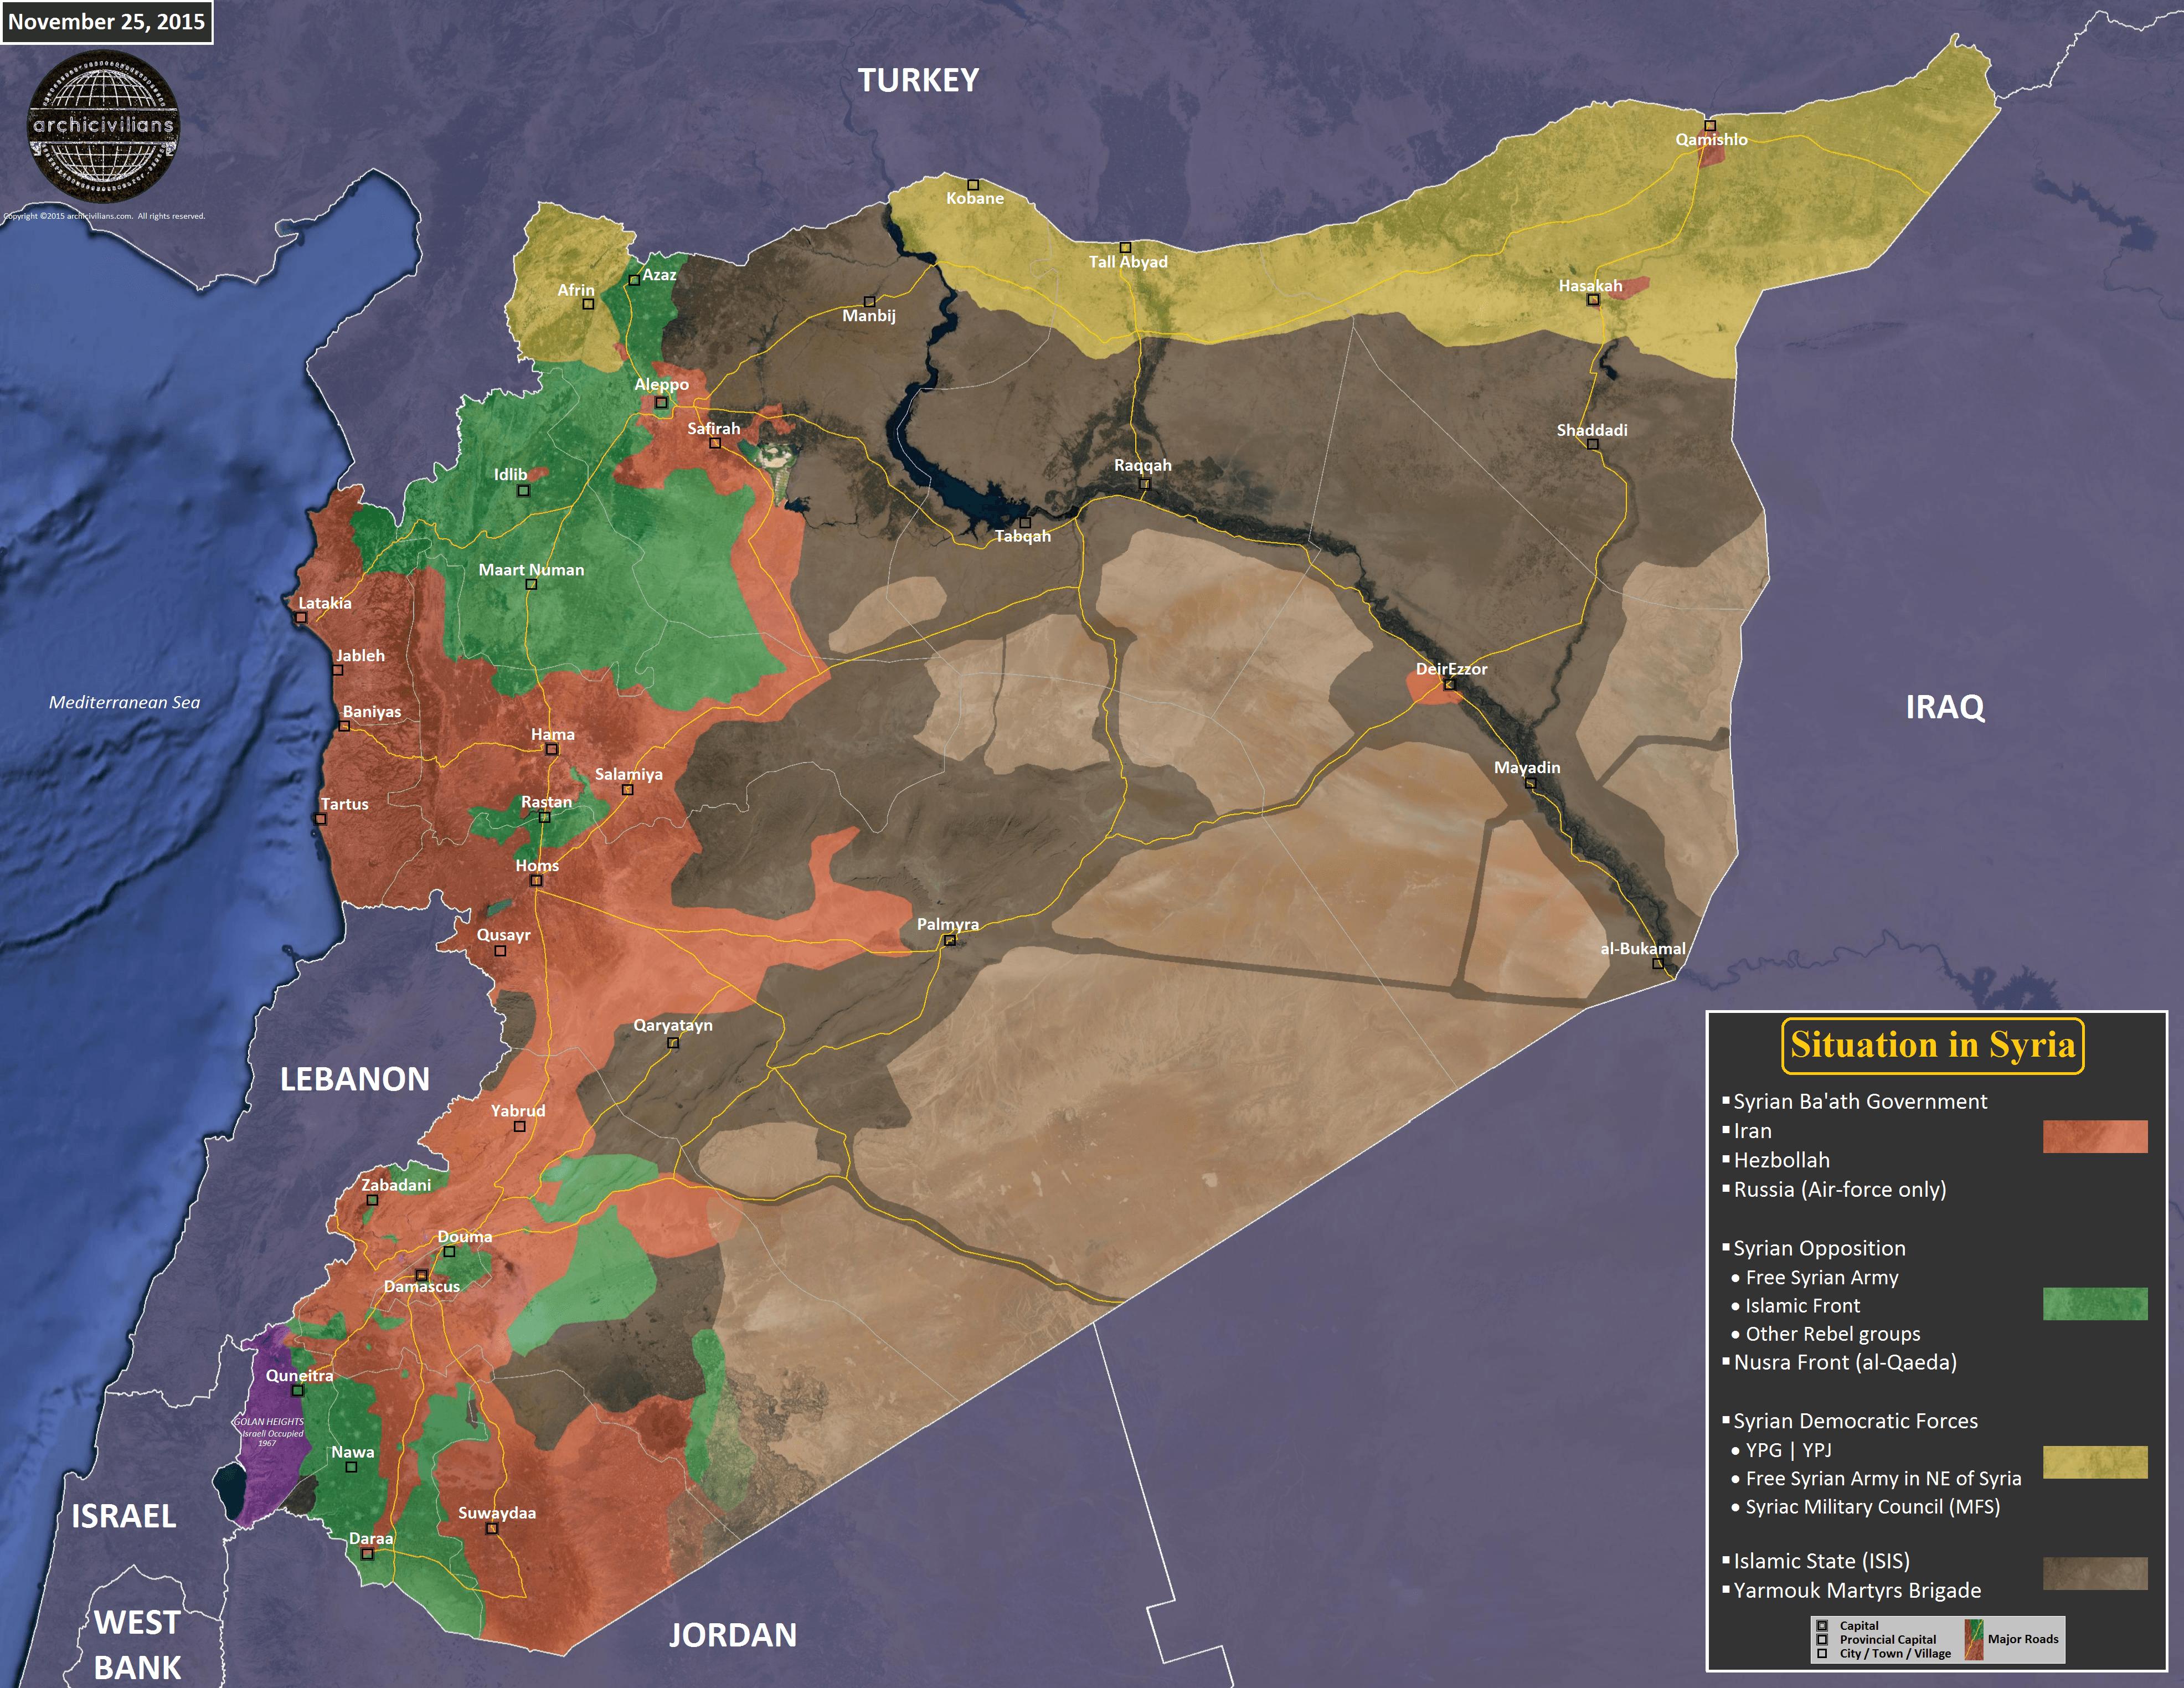 syria-nov25.png